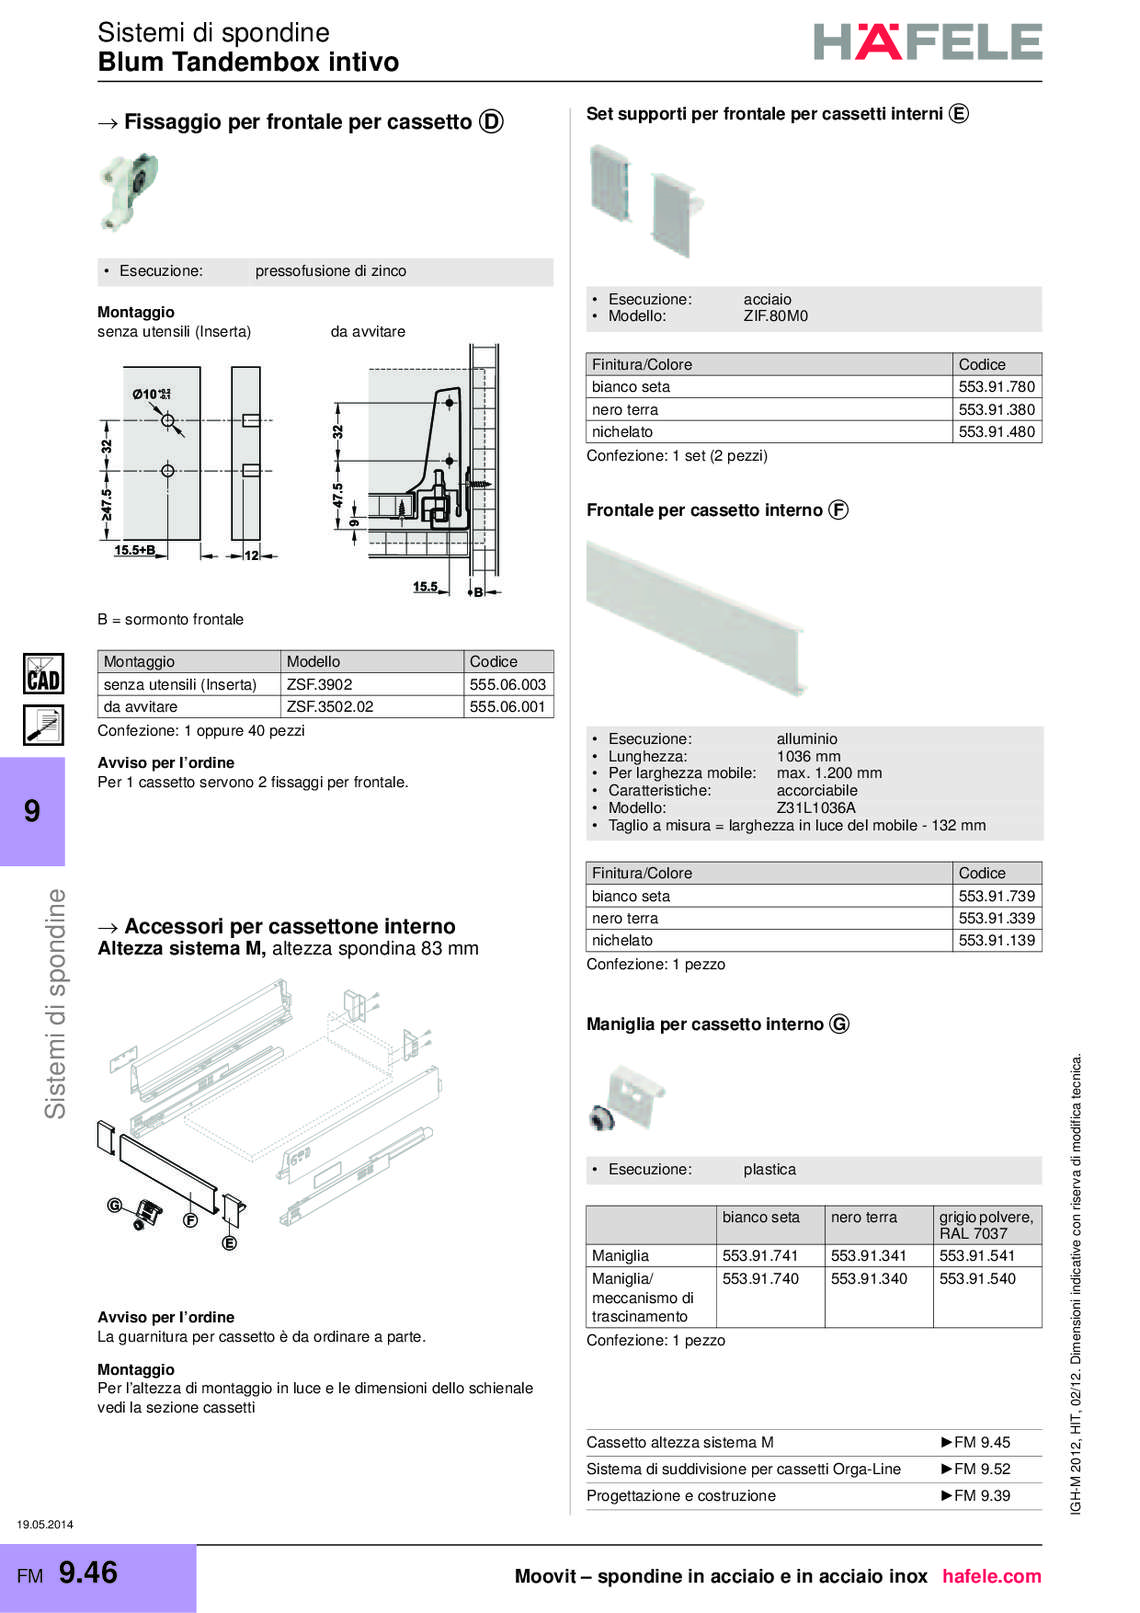 hafele-spondine-e-guide-per-mobili_40_057.jpg